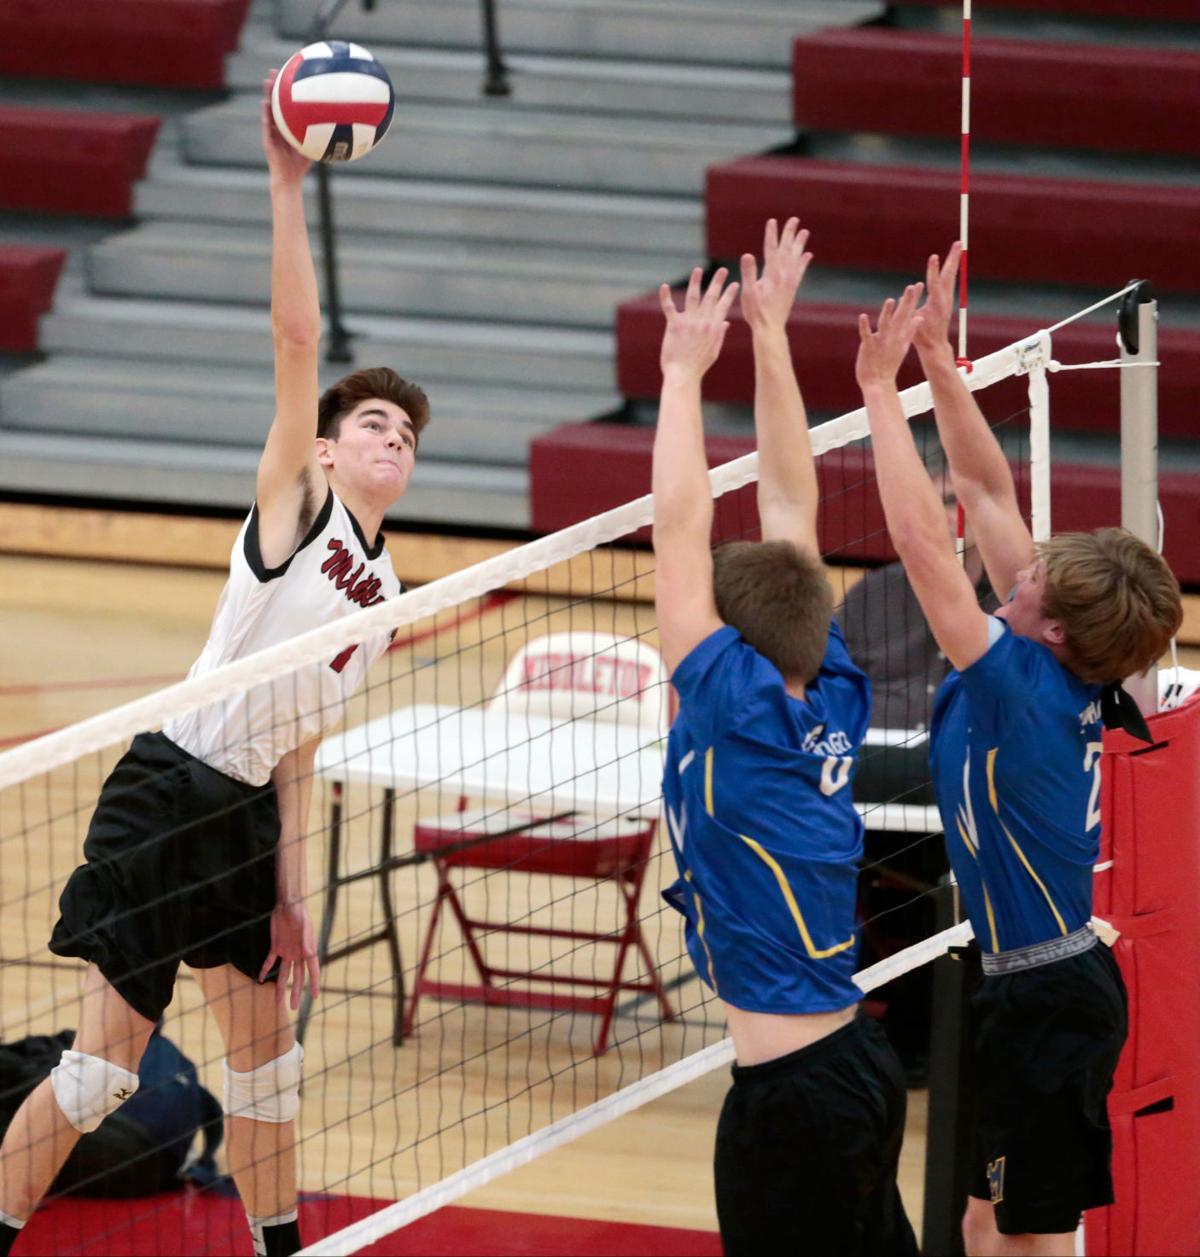 Prep boys volleyball photo: Middleton's Eagan Peters-Michaud